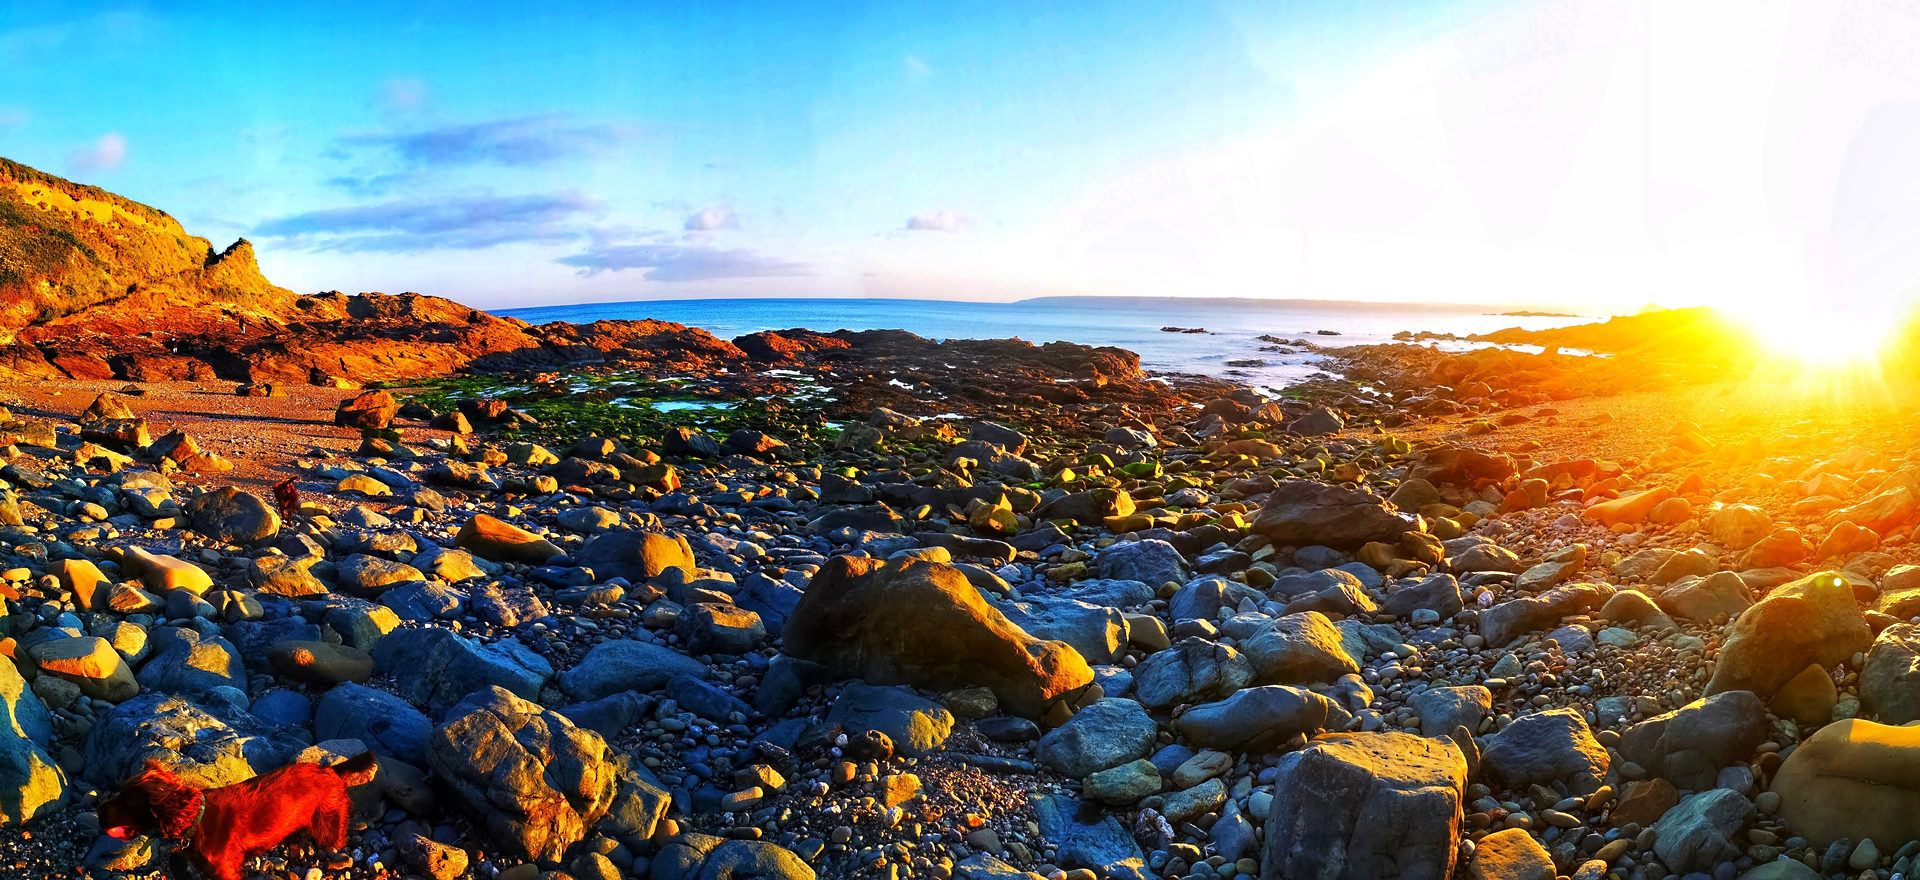 Cornish Sunset Landscape